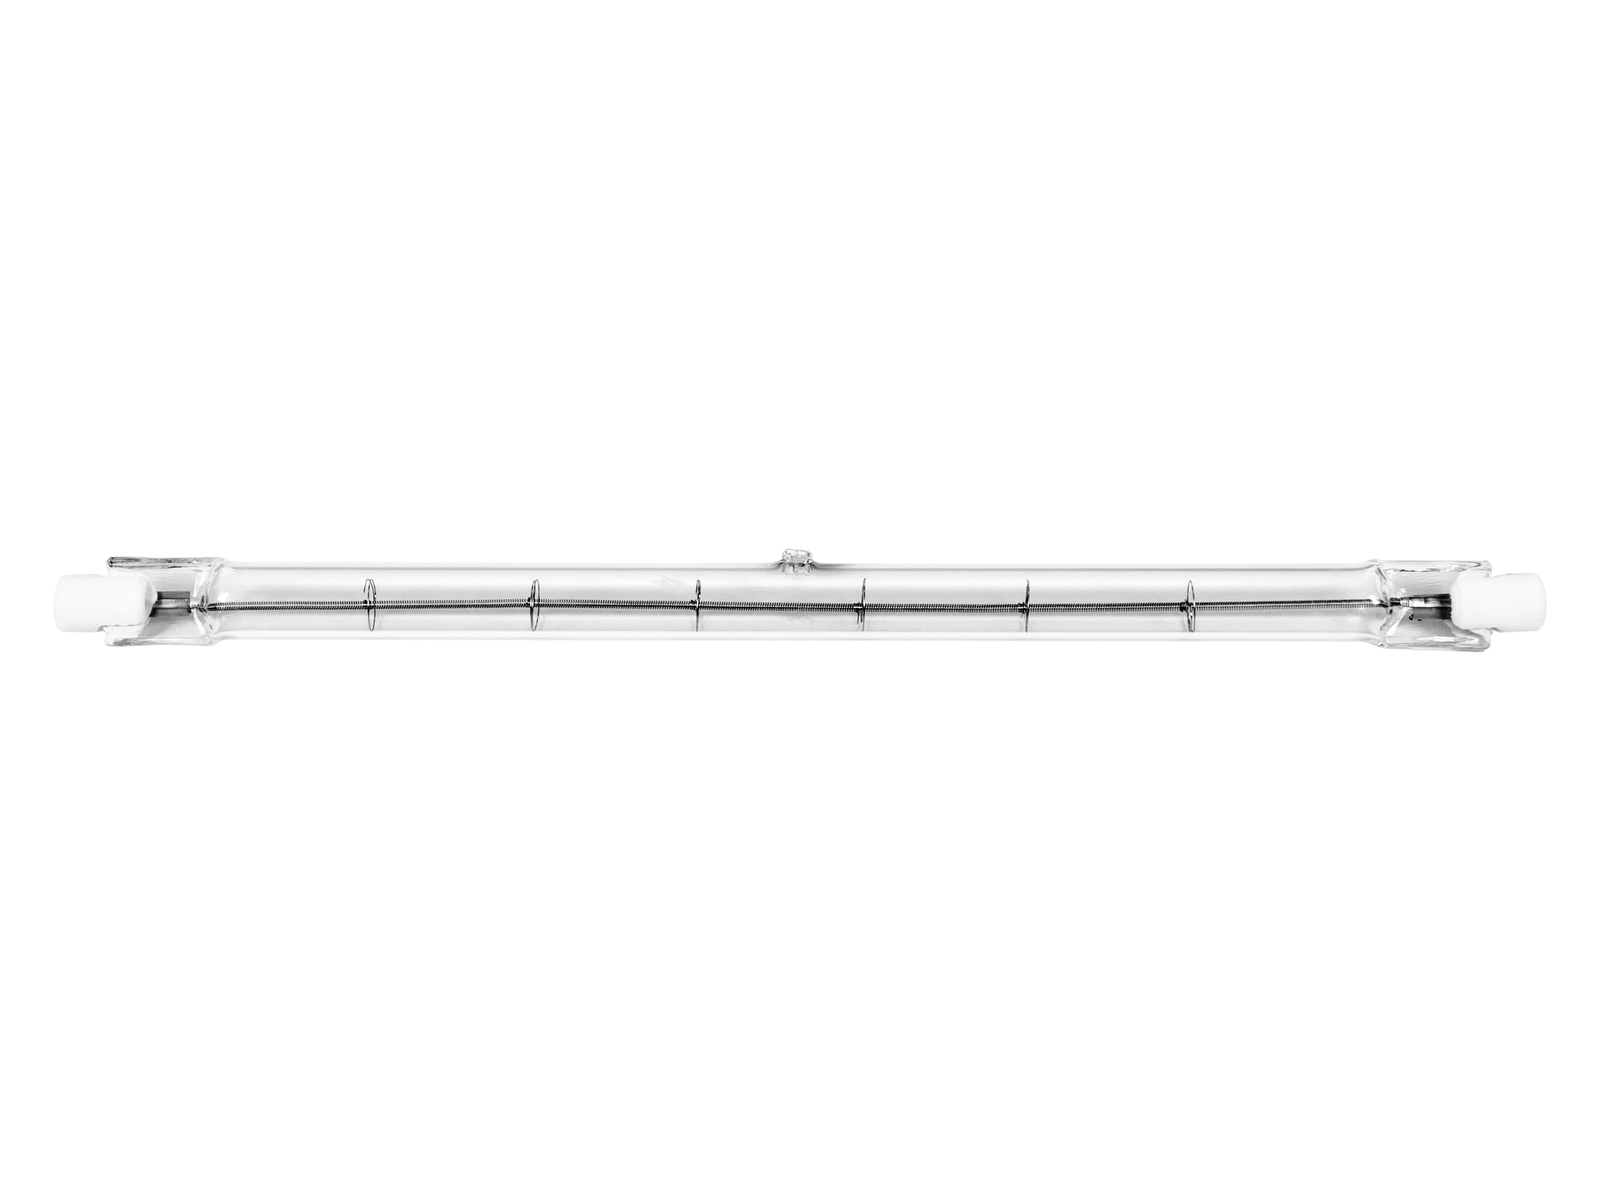 Lampada Alogena Lineare Omnilux 230V/1000W R7s 189mm